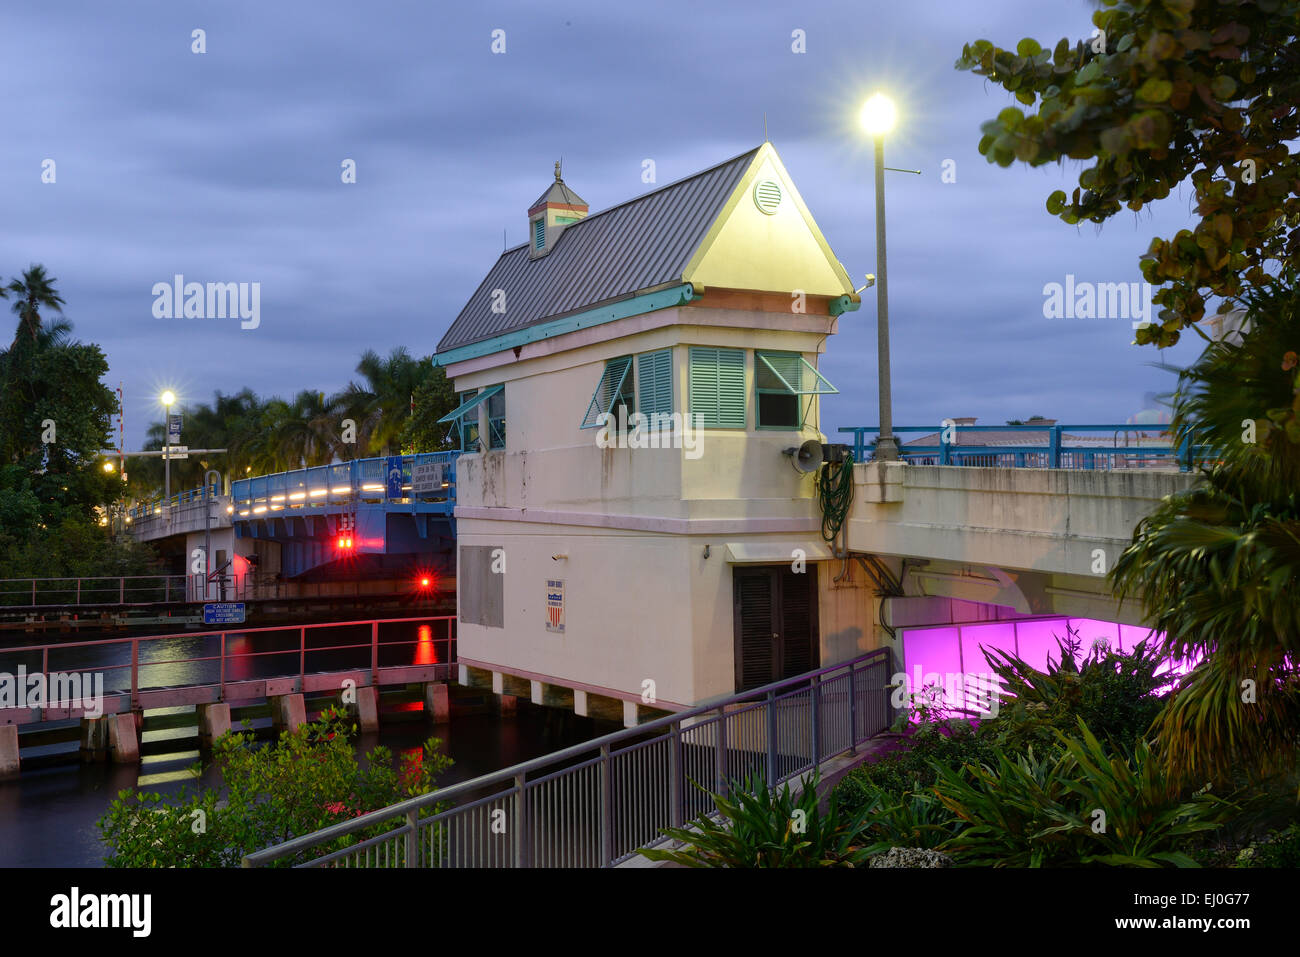 USA, Florida, Palm Beach County, Del Rey Beach - Stock Image